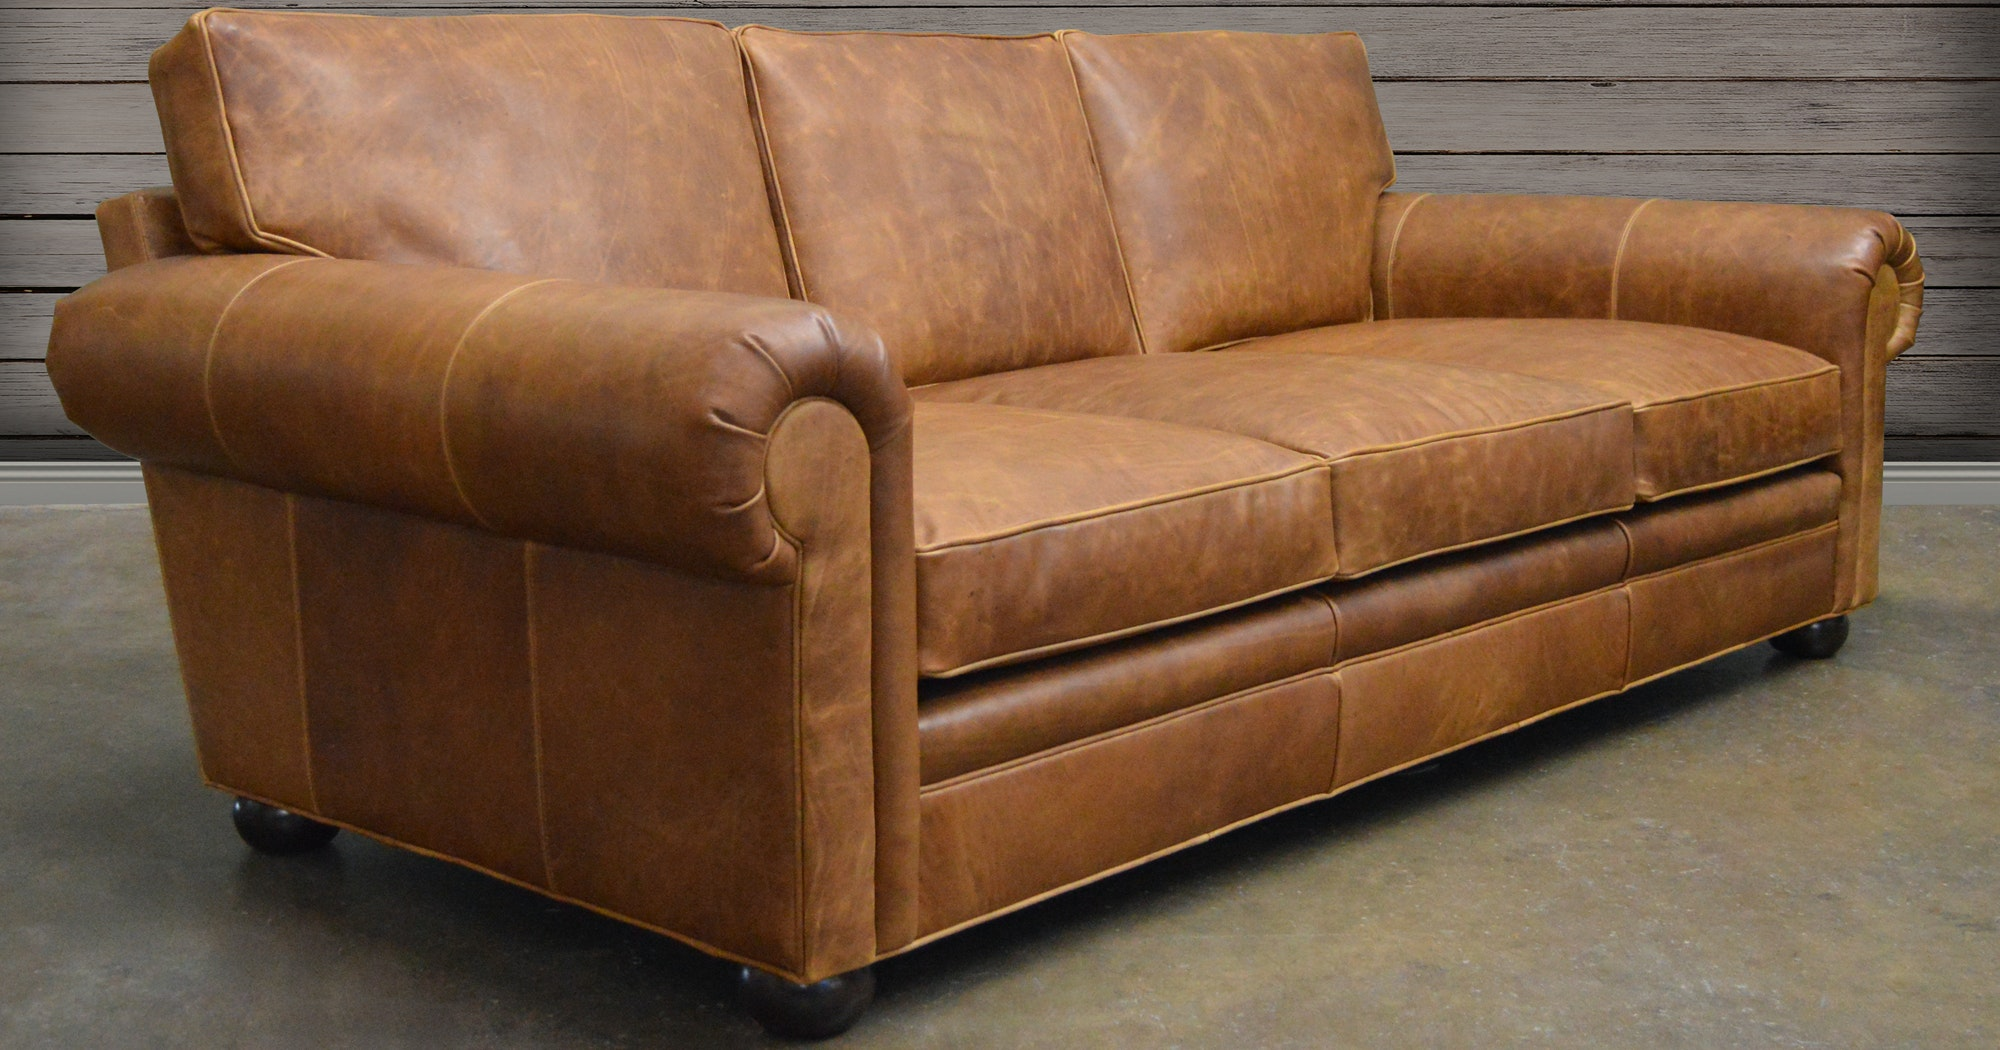 Great Langston Leather Sofa In Italian Brentwood Tan Leather